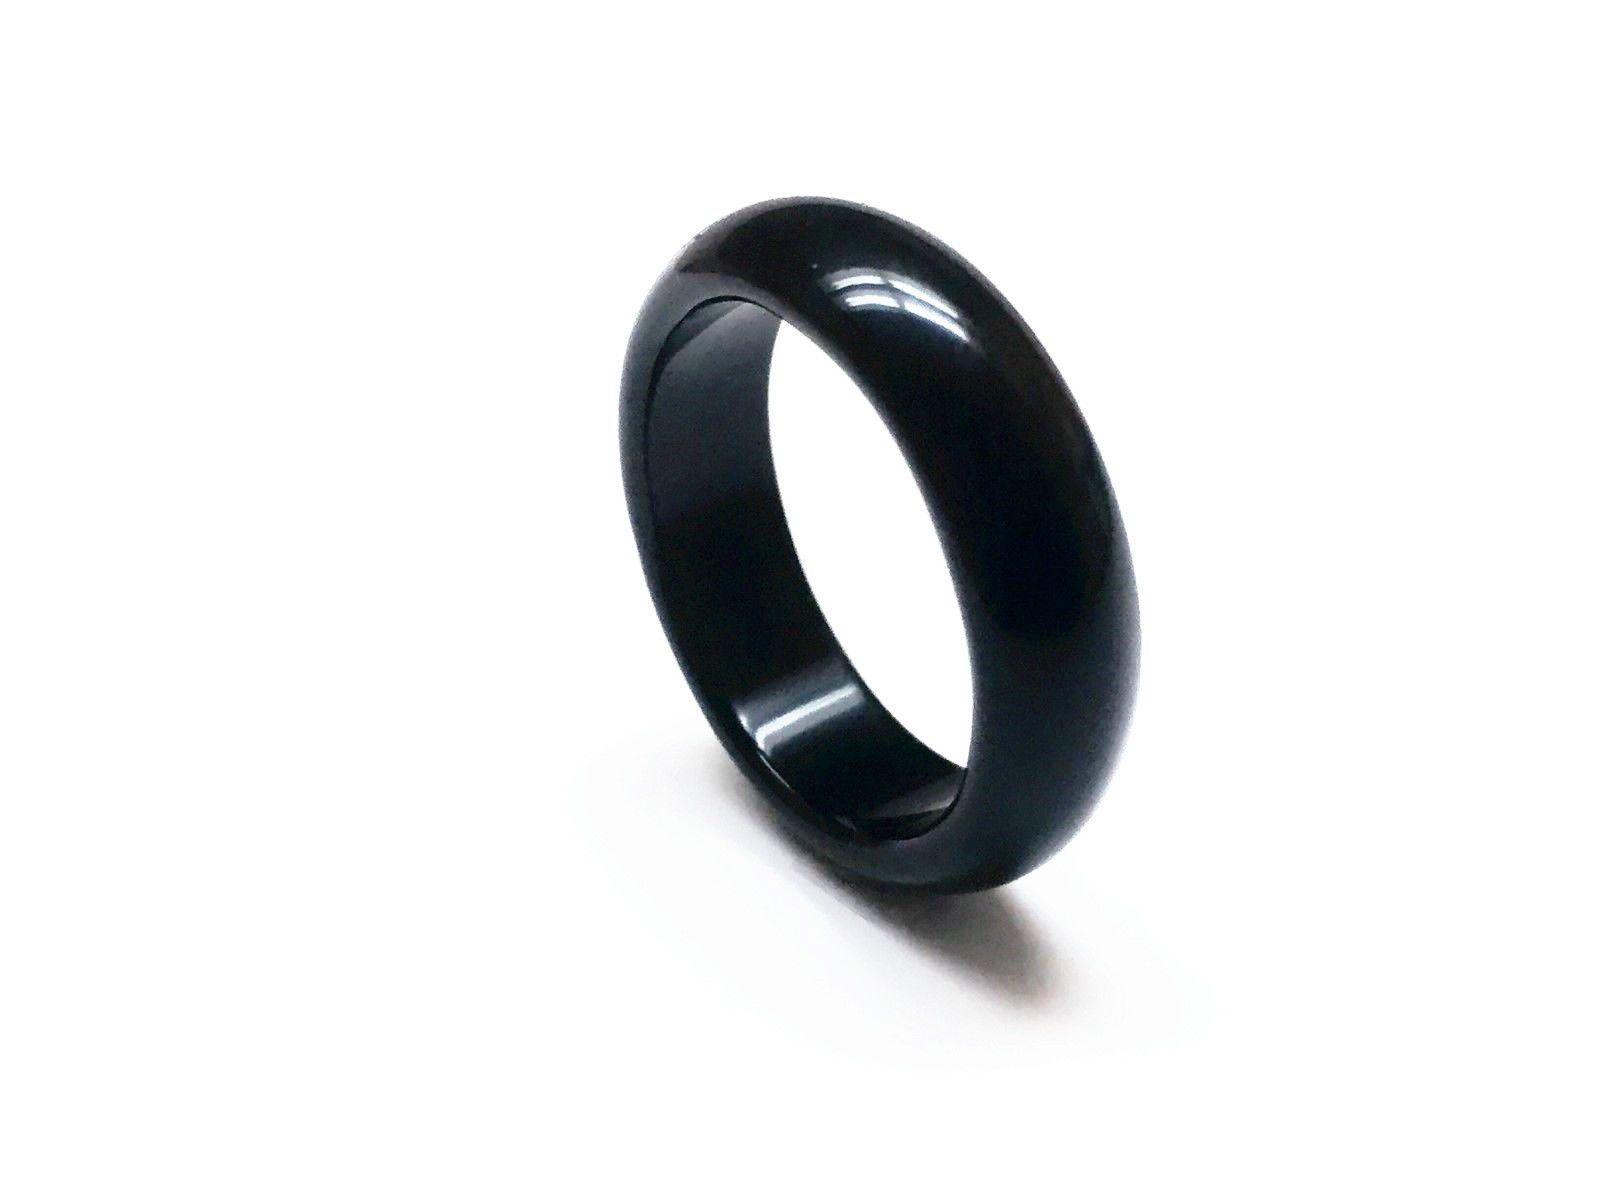 cf523305da695 Description Instructions: Please choose the ring sizes to place ...